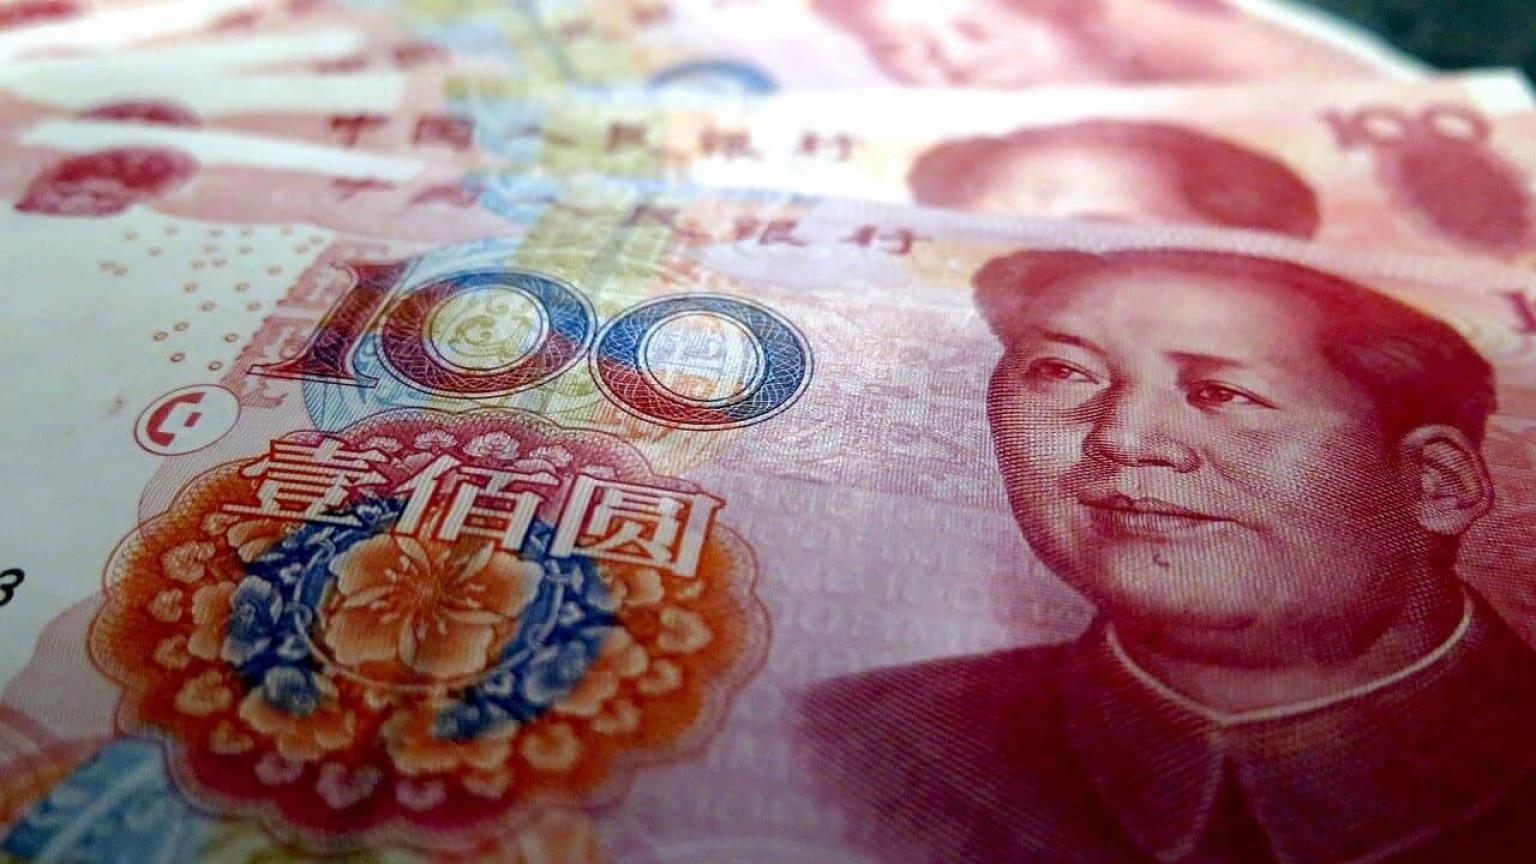 Chinese Crowdfunding platforms and development